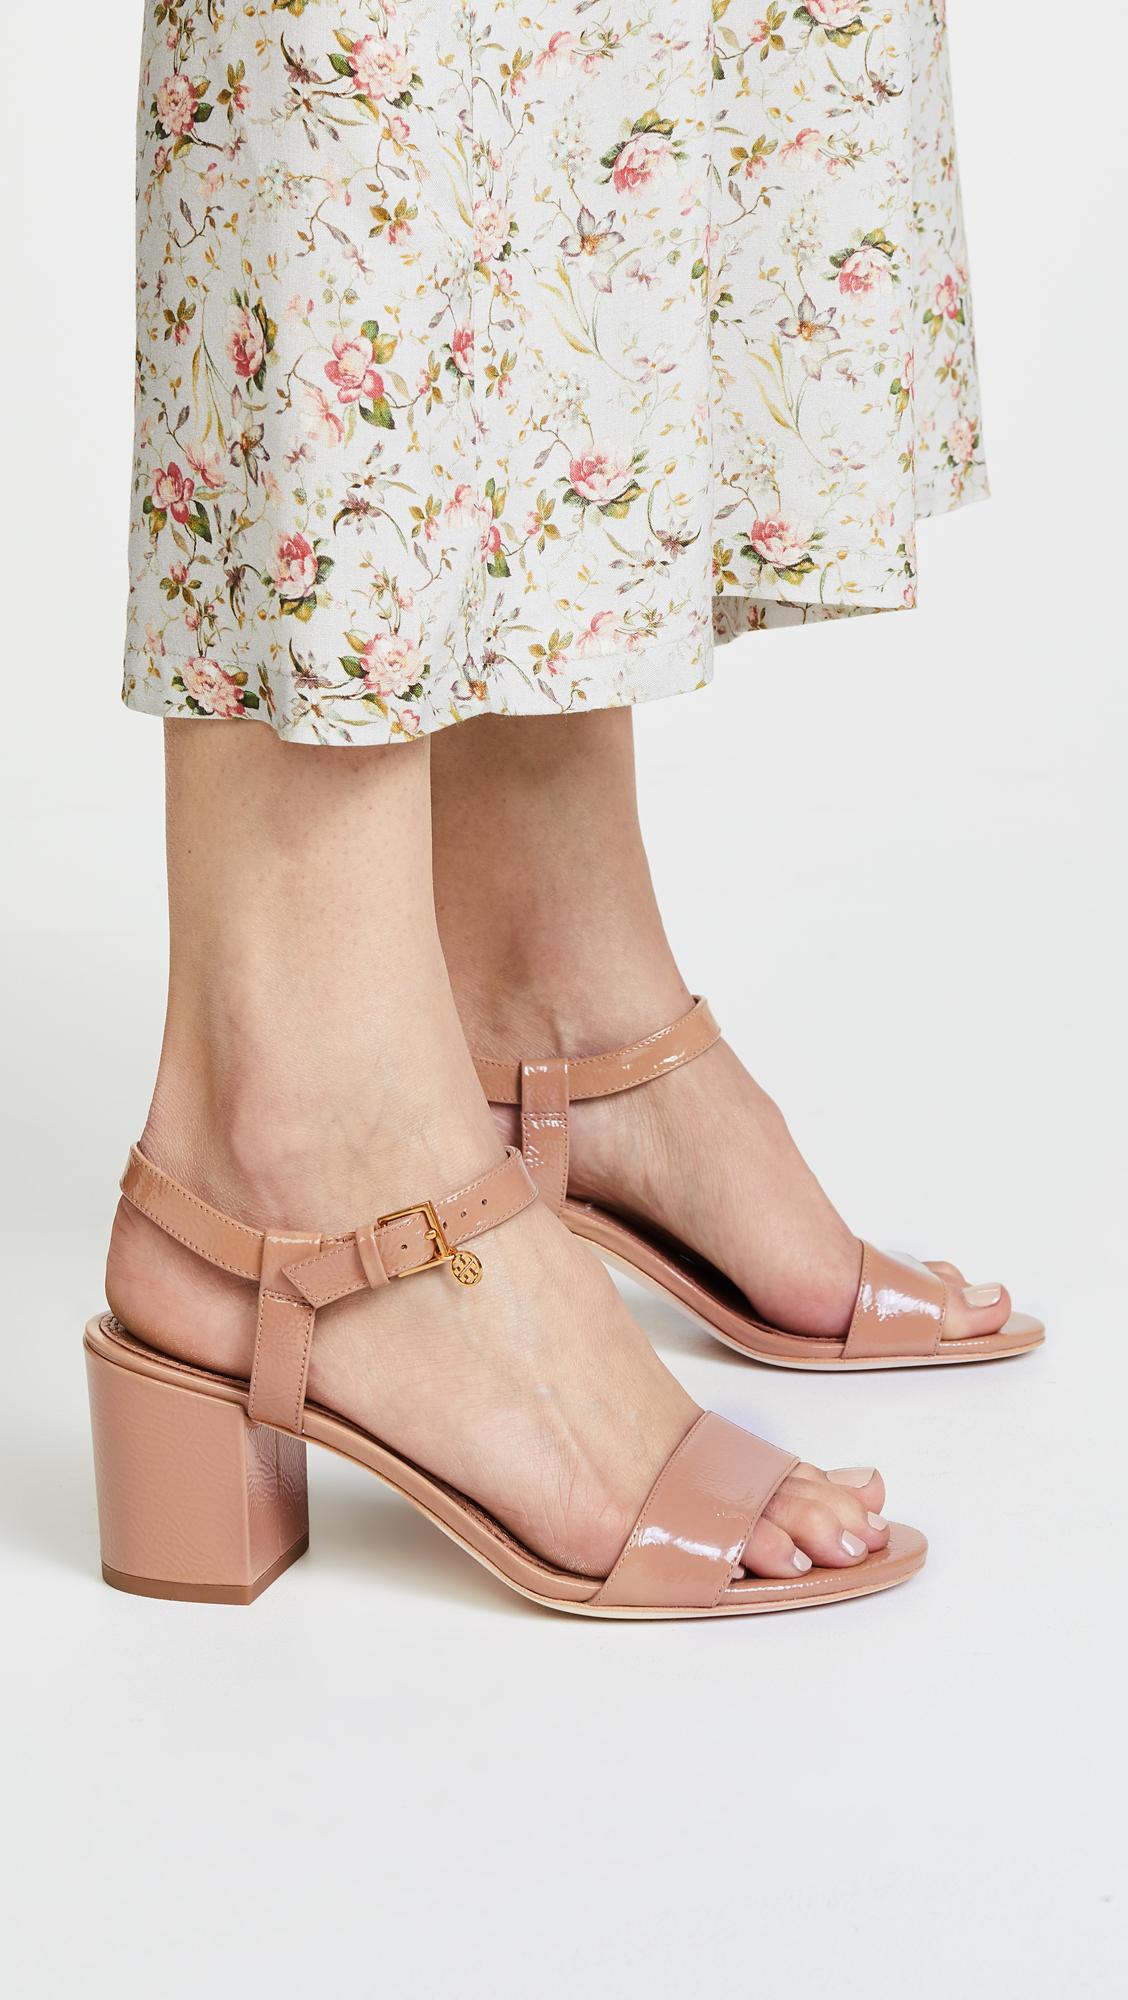 172c04621a6 Tory Burch Laurel 65mm Ankle Strap Sandals